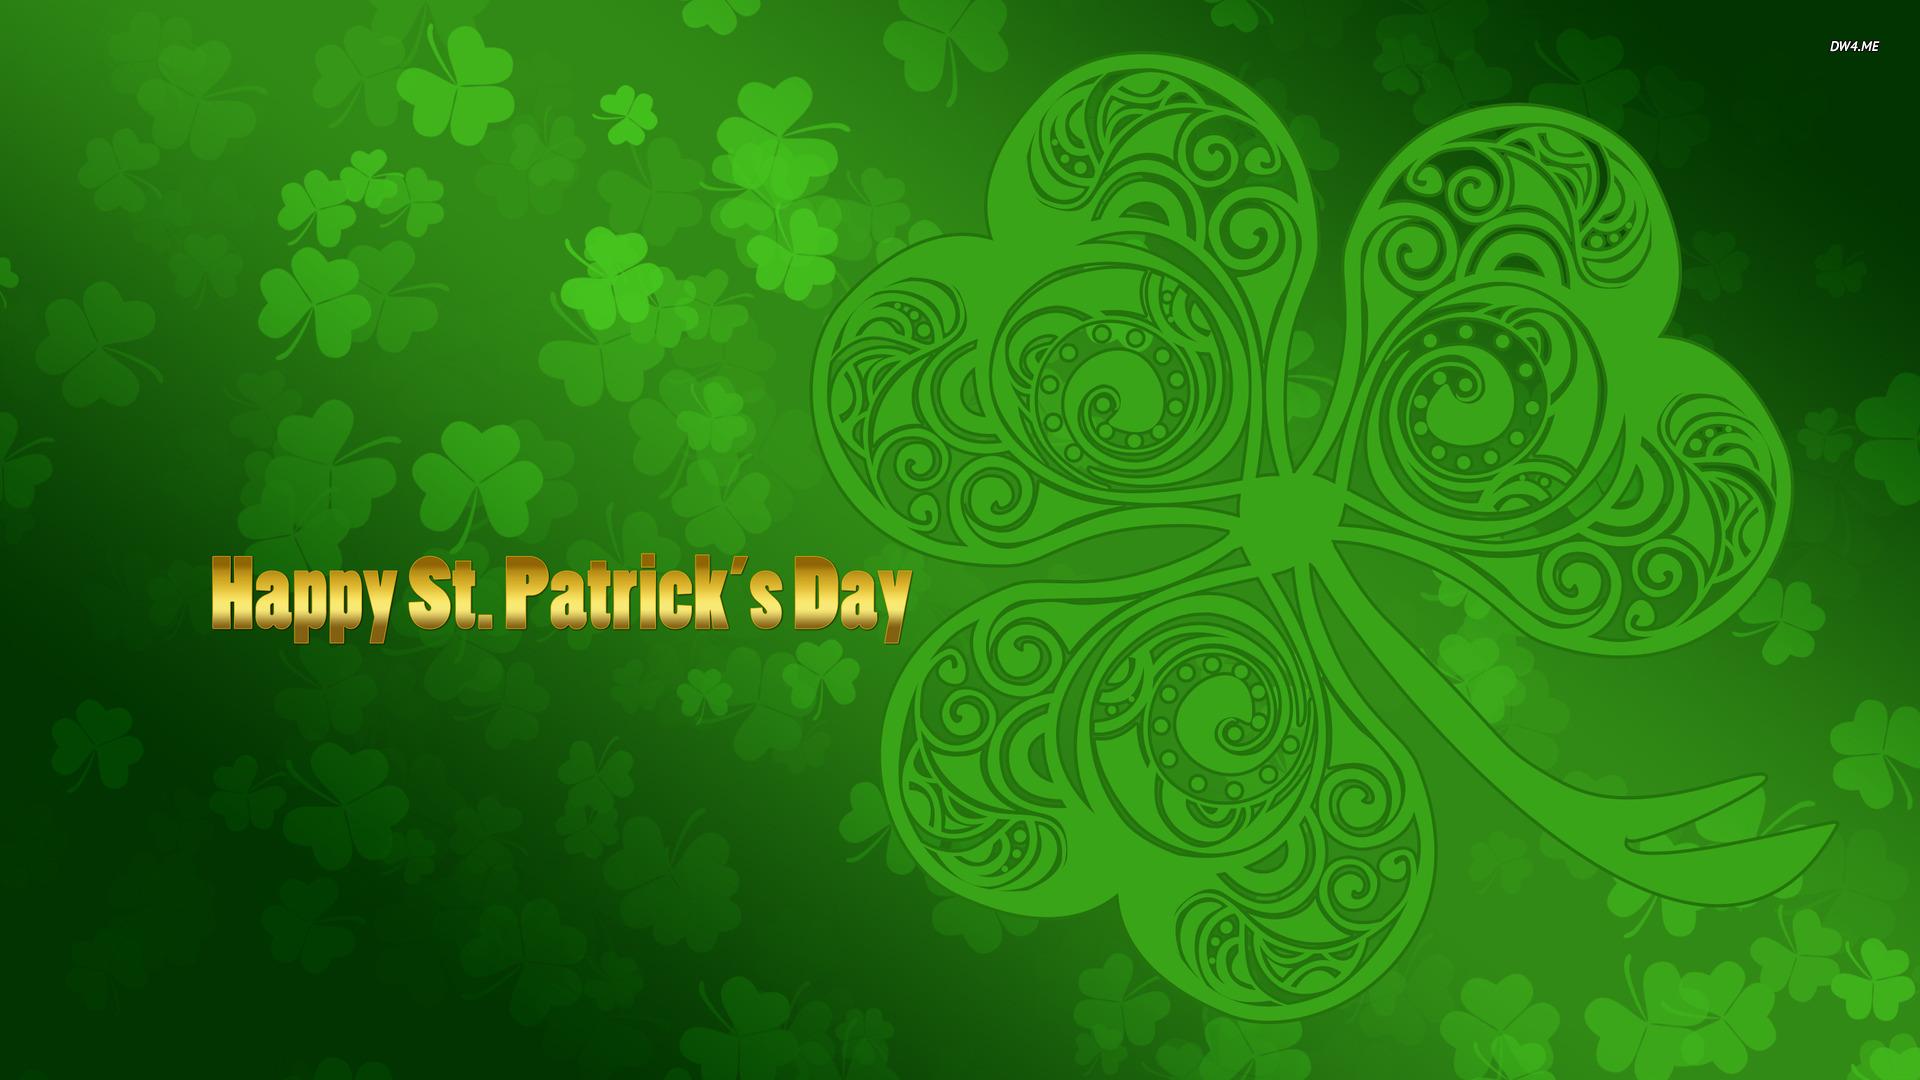 Holidays Clover Saint Patricks Day Shamrock St Patrick 1920x1080